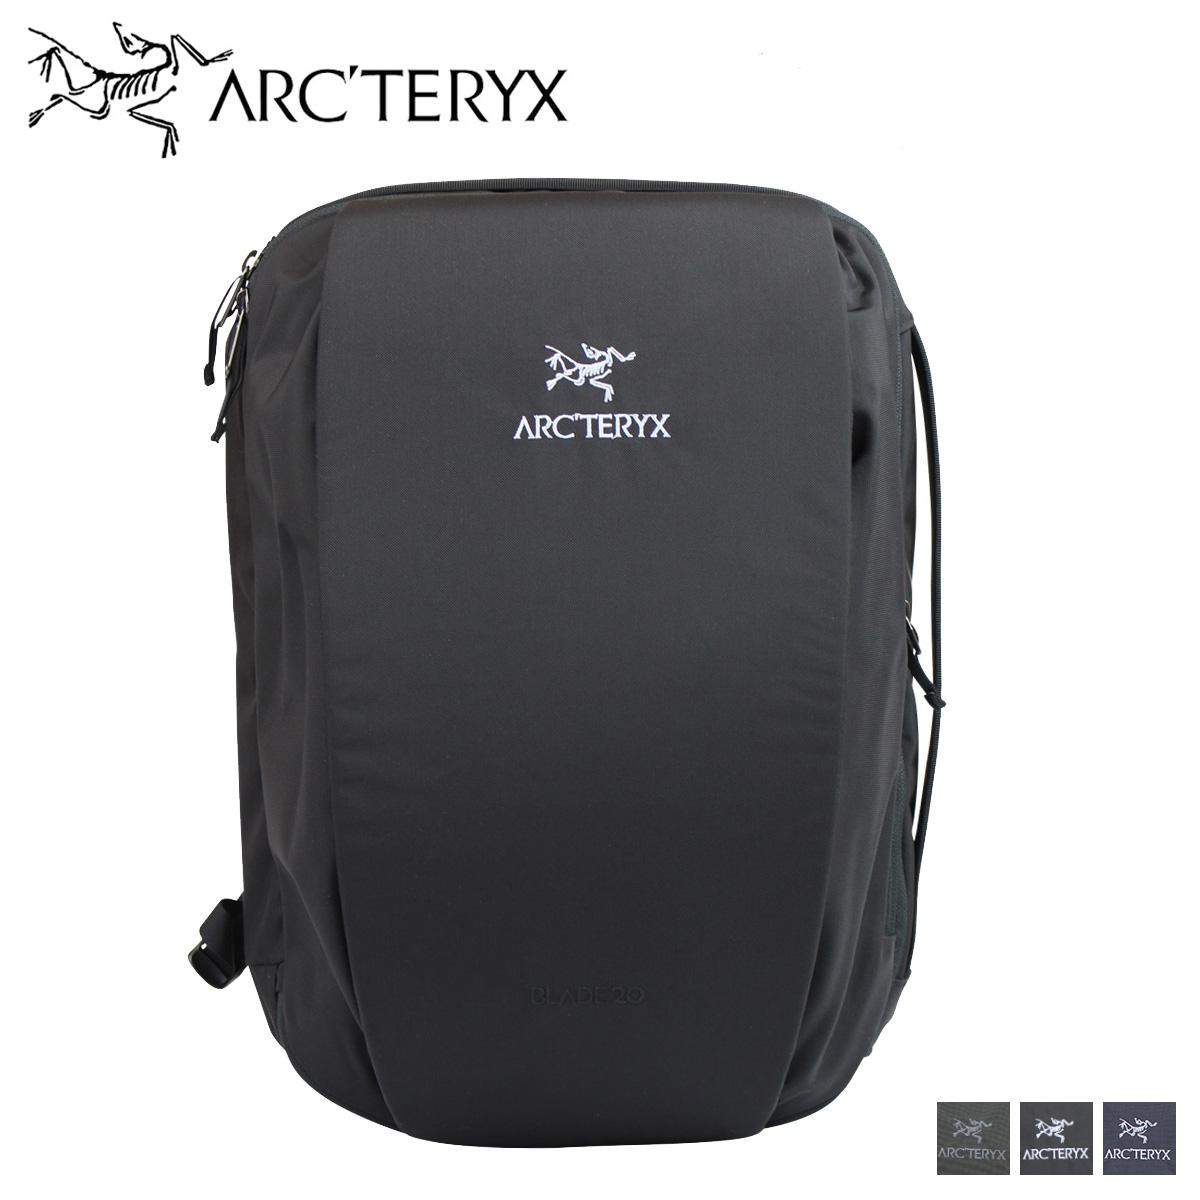 ARCTERYX アークテリクス リュック バッグ バックパック メンズ 20L BLADE 20 ブラック グレー ネイビー 黒 16179